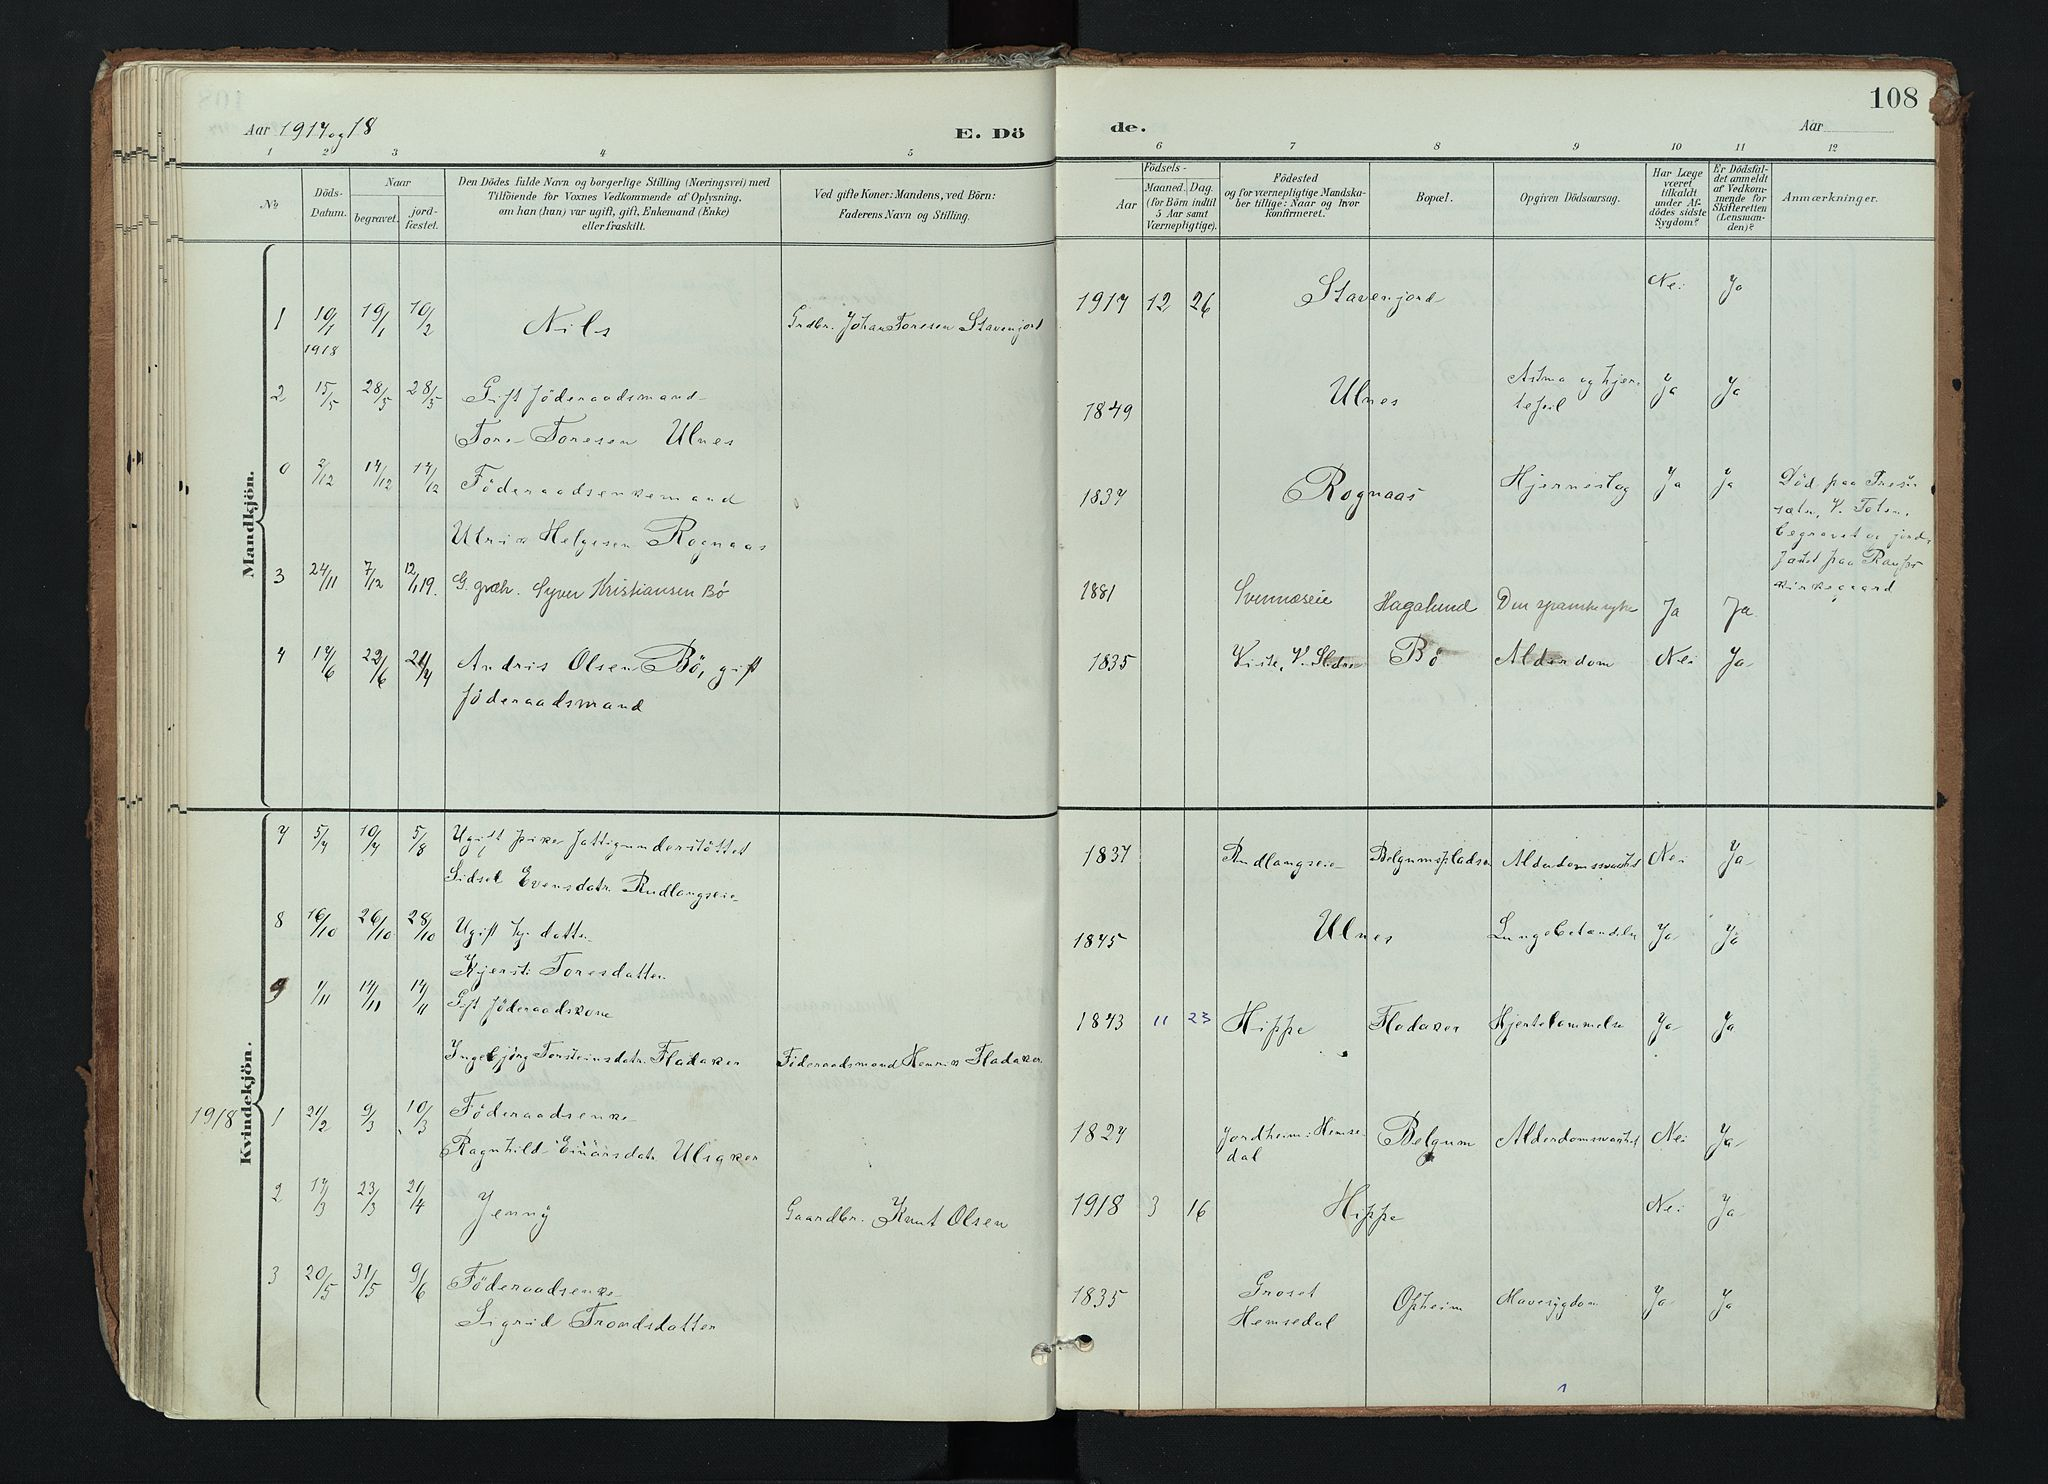 SAH, Nord-Aurdal prestekontor, Ministerialbok nr. 17, 1897-1926, s. 108